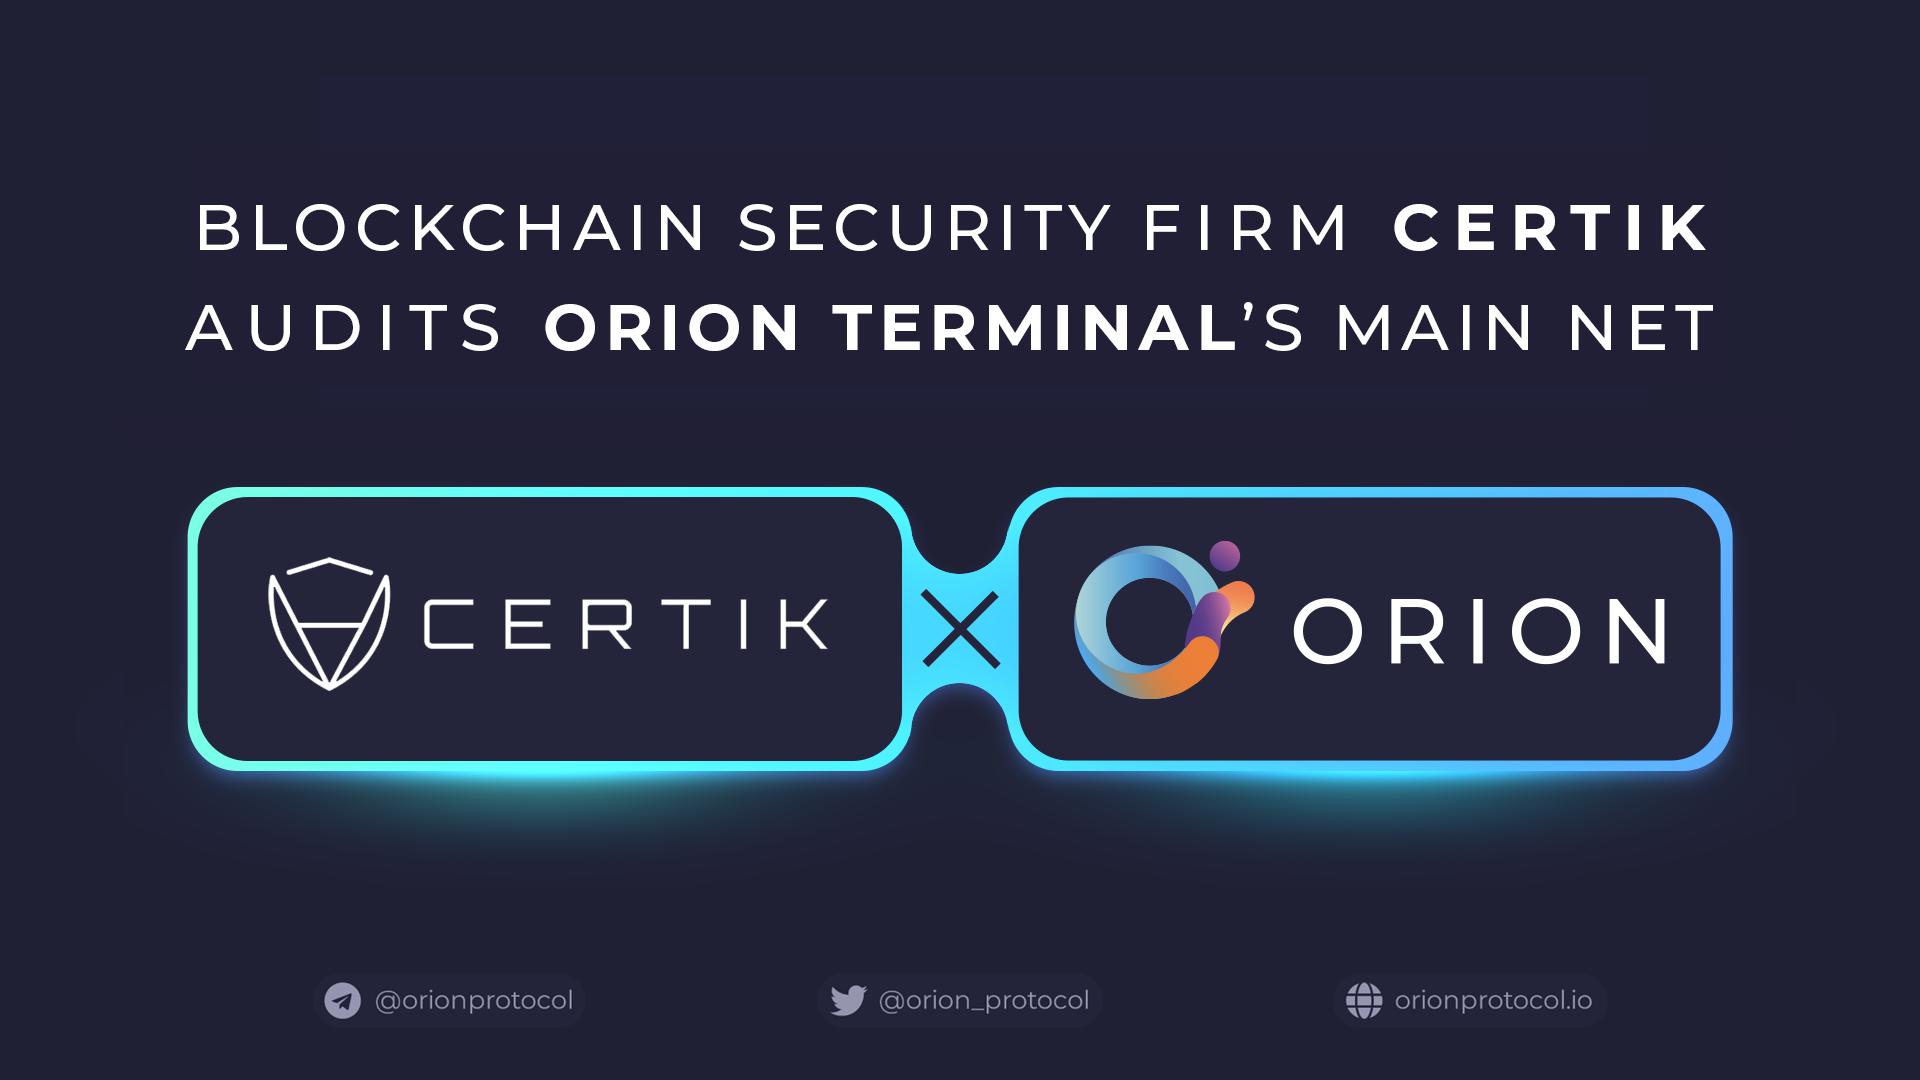 Certik Audits Orion Terminal's Main Net